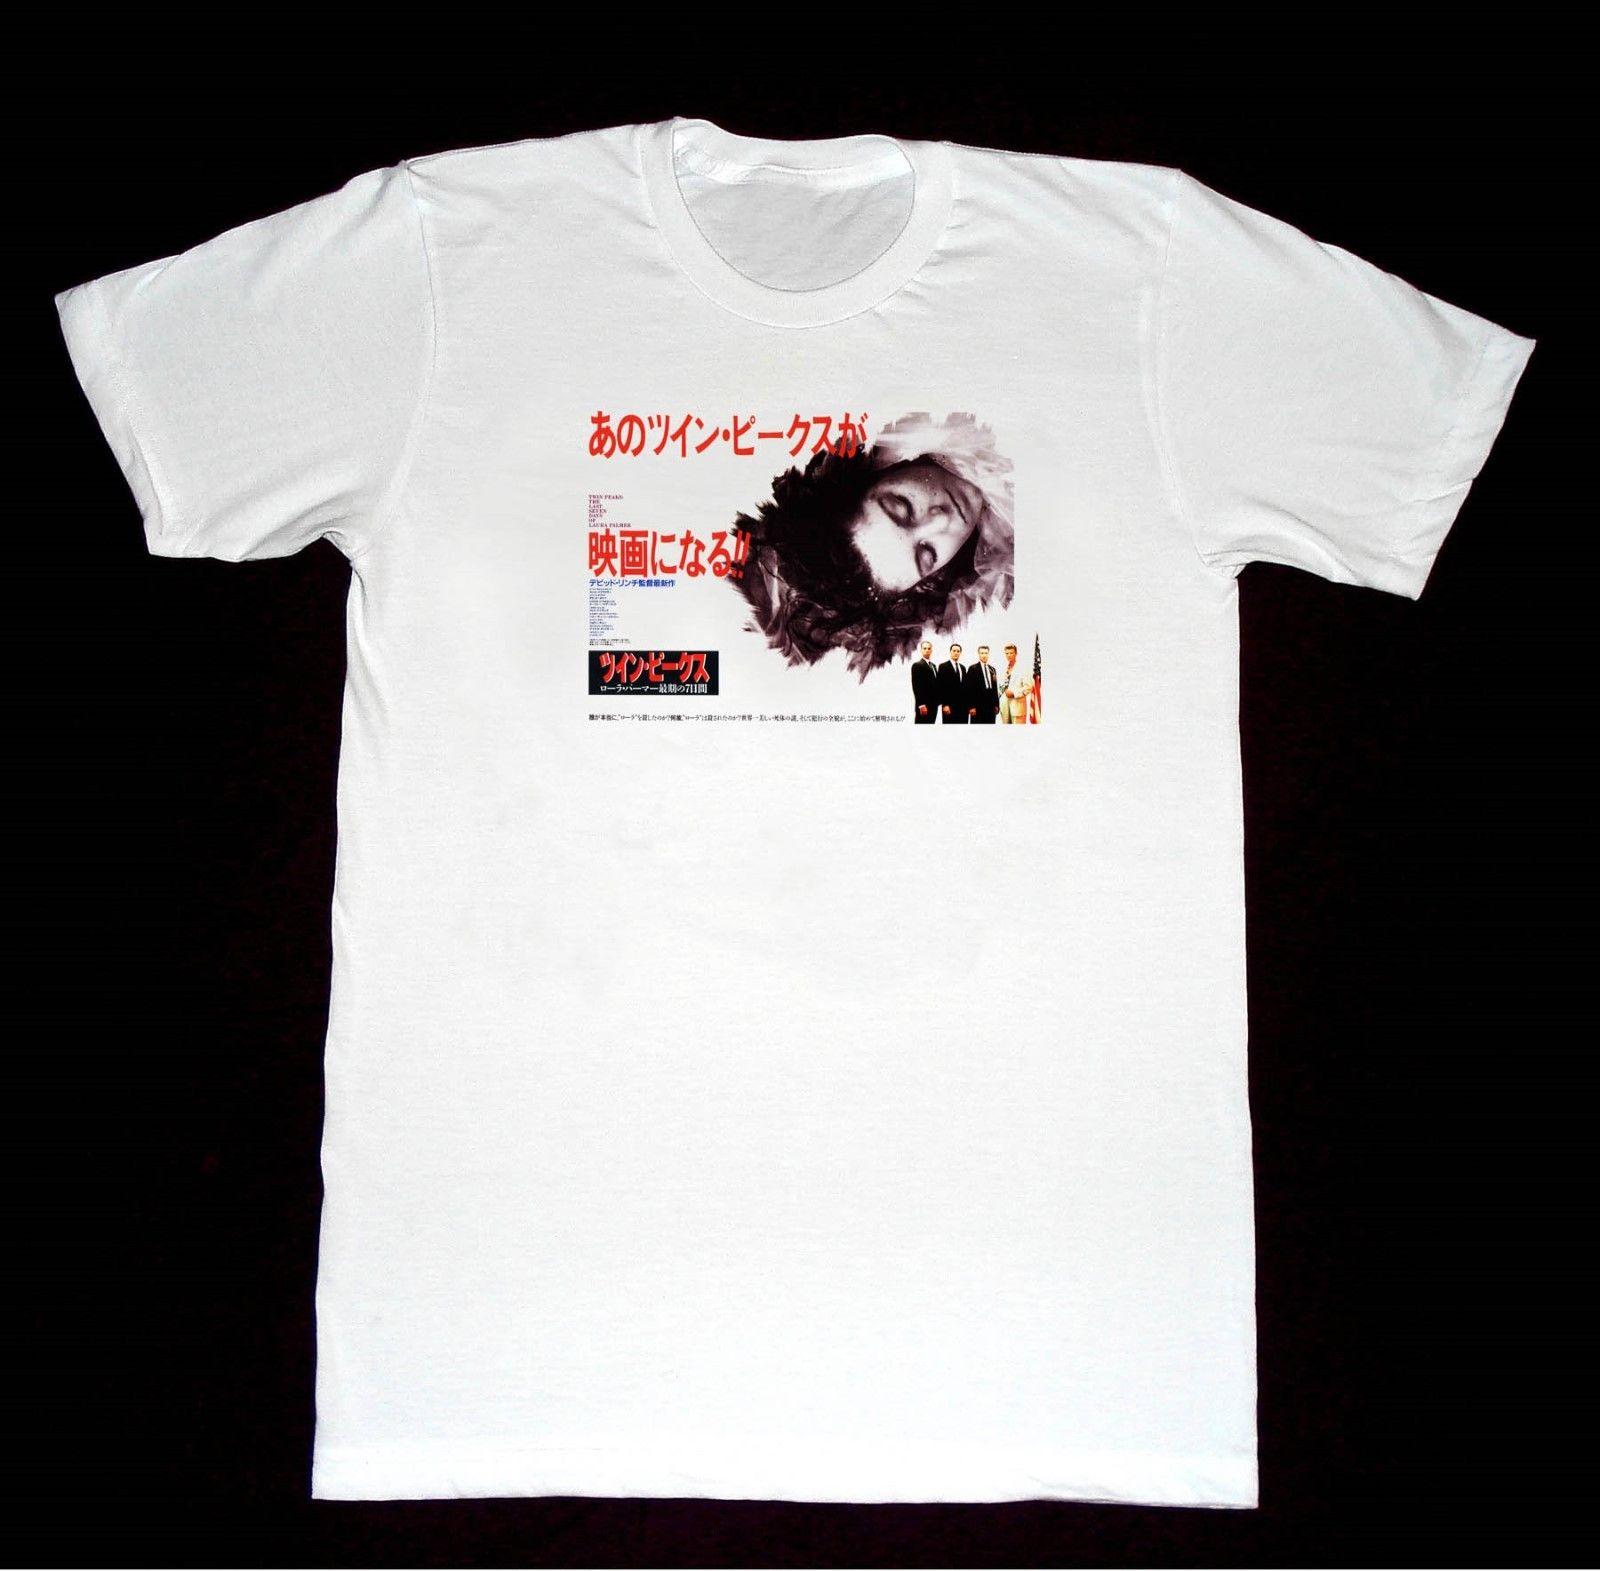 Twin Peaks Japanese Import T Shirt David Lynch Eraserhead Men New High Quality Top Tee Adult T-Shirt S-3Xl